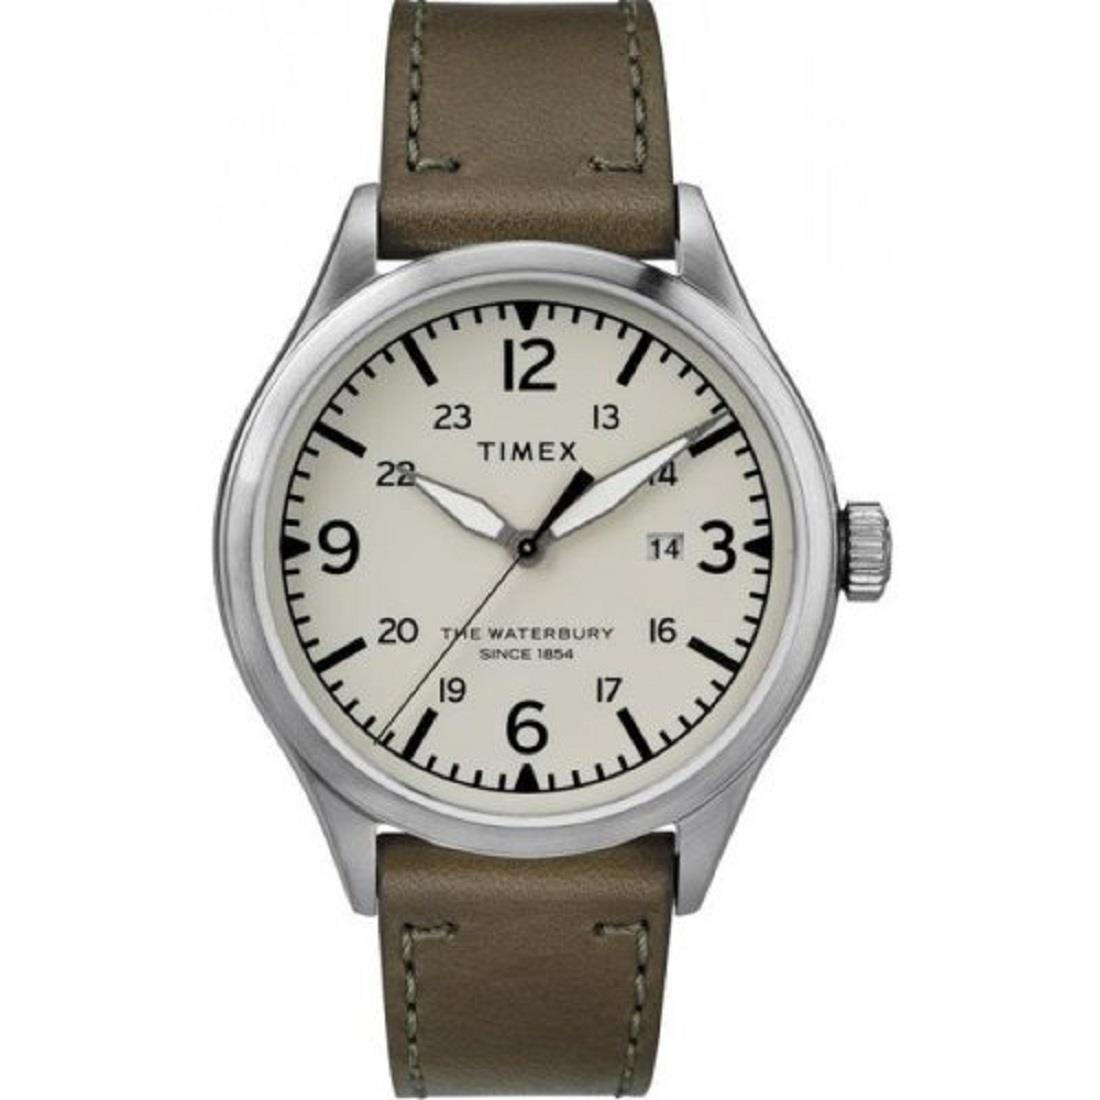 Orologio uomo cassa 41 mm - TIMEX